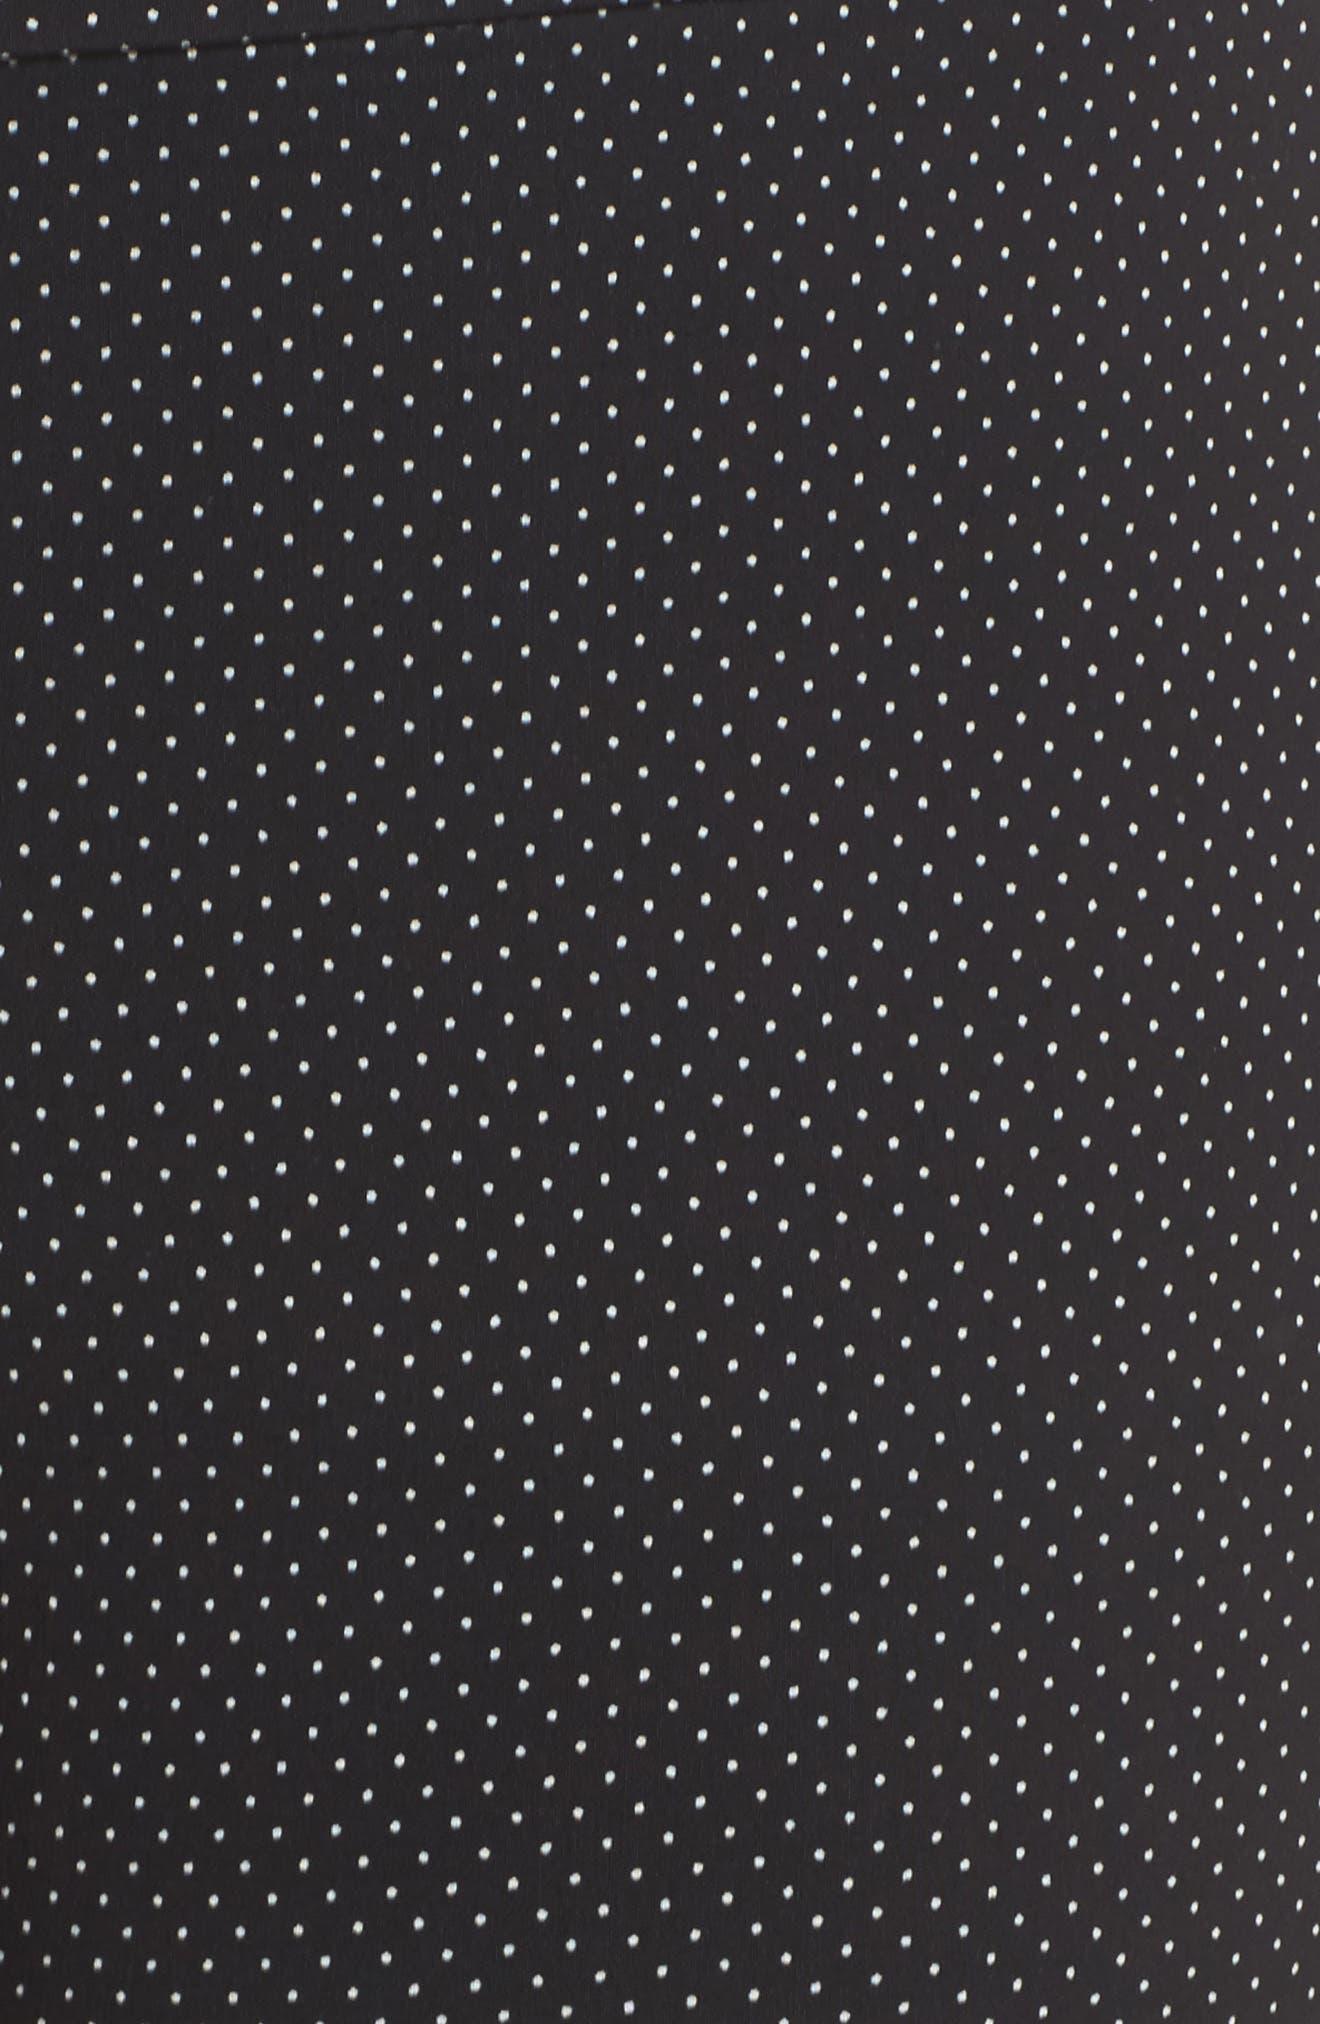 Polka Dot Crop Pants,                             Alternate thumbnail 5, color,                             001